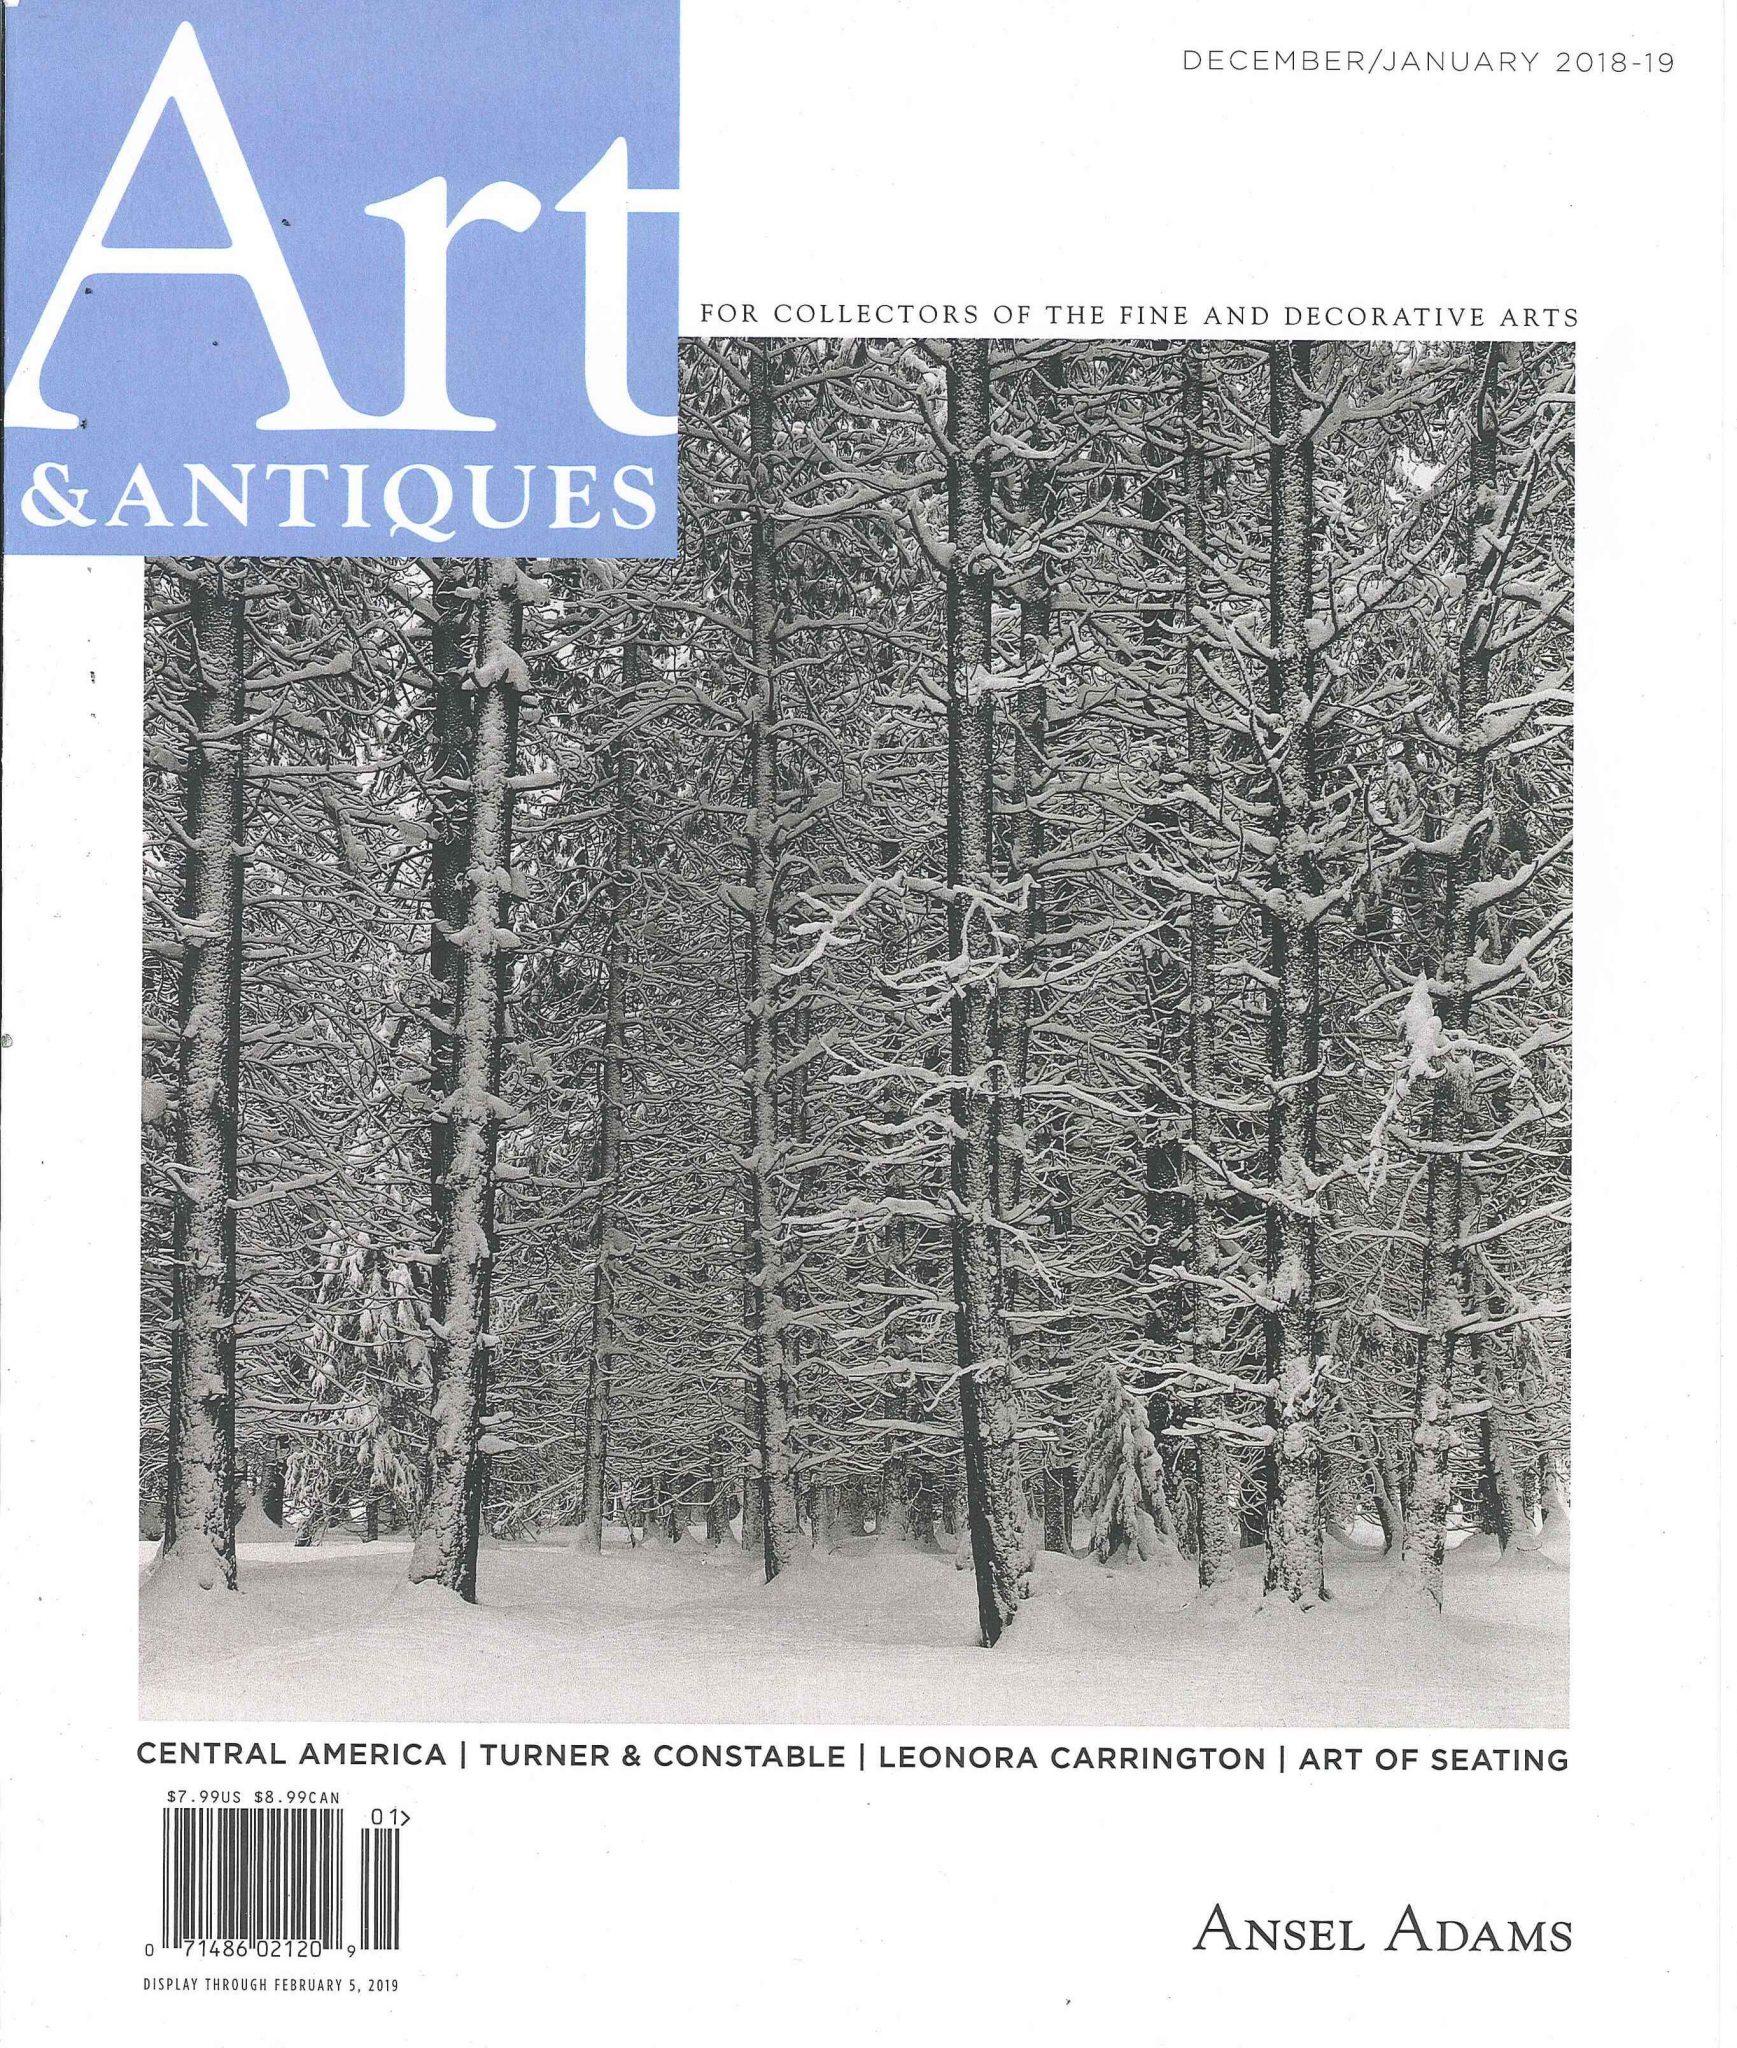 Art & Antiques Magazine - Dec 2018/Jan 2019 - Palm Beach Show